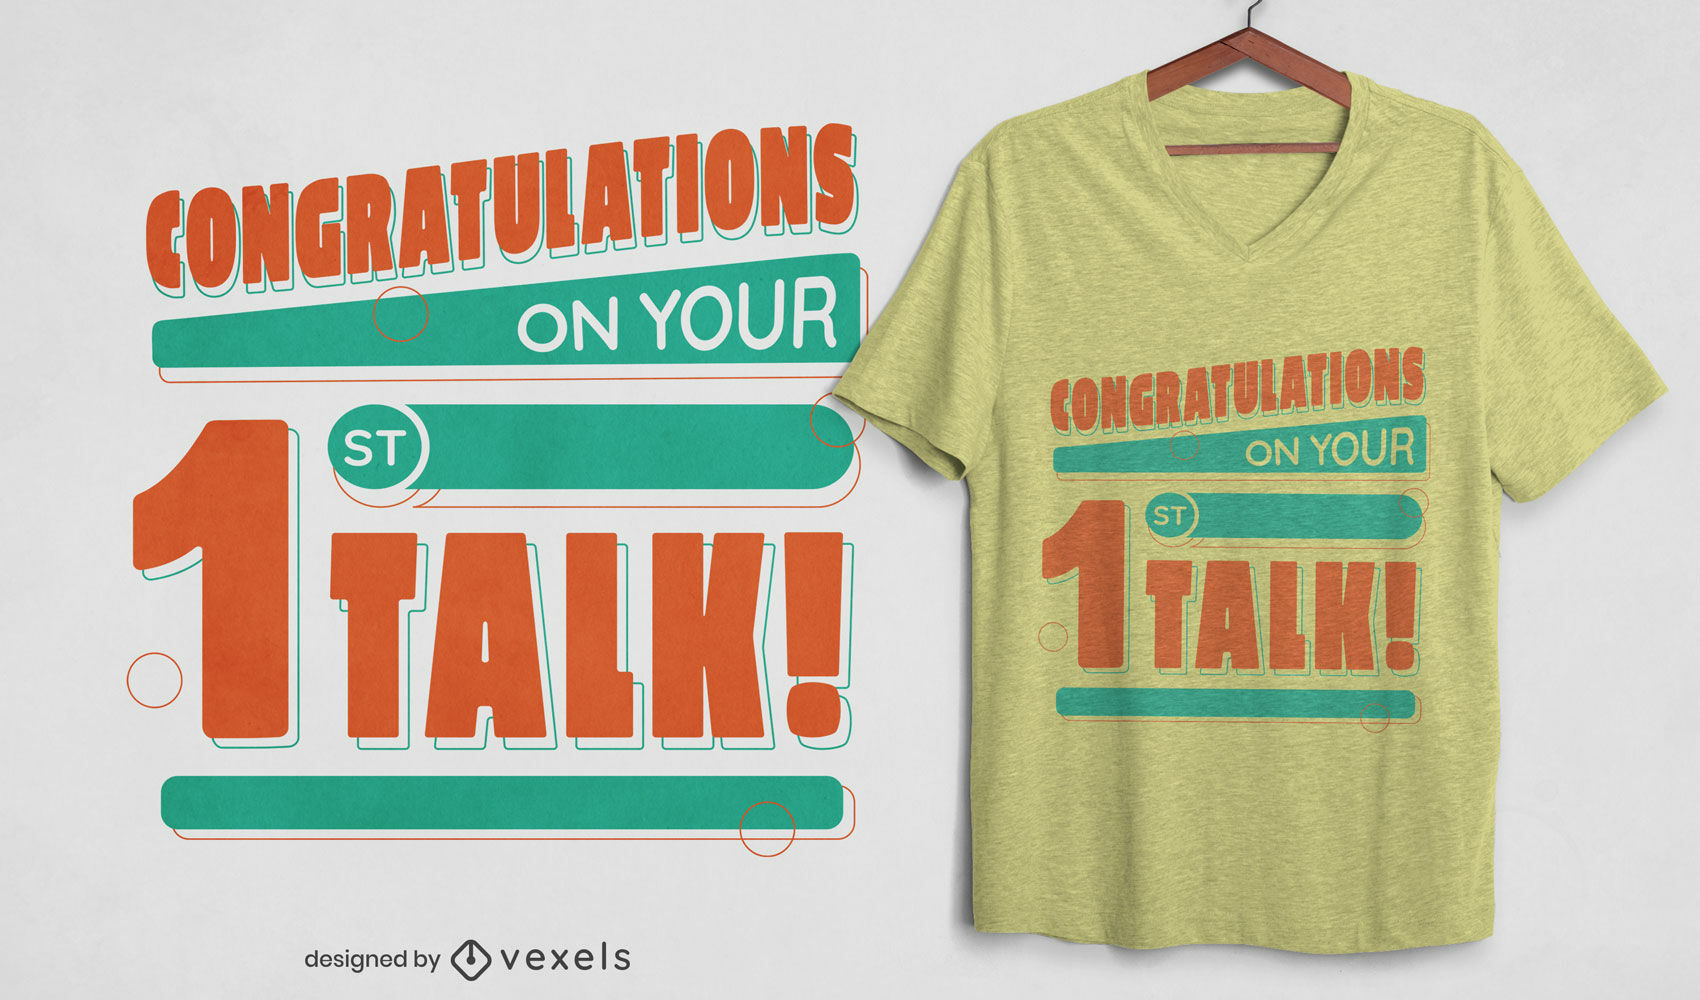 Congratulations quote t-shirt design